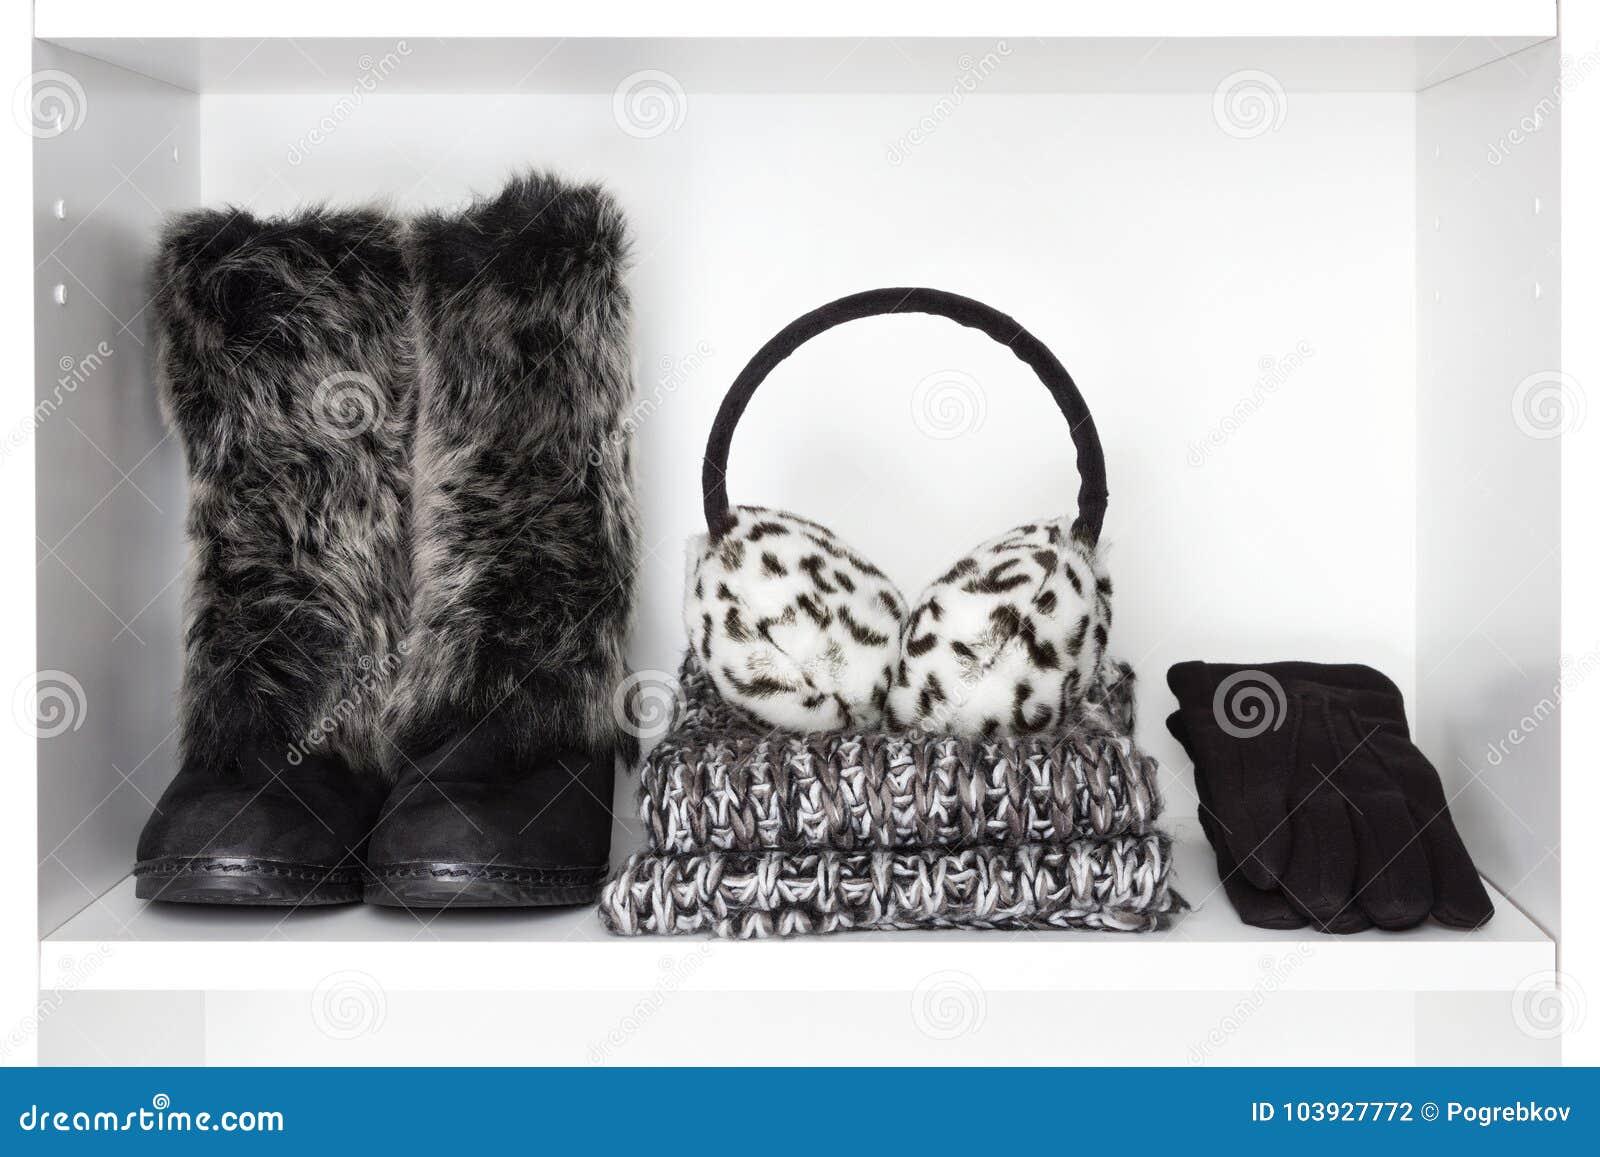 Winter fashion women accessories on white shelf